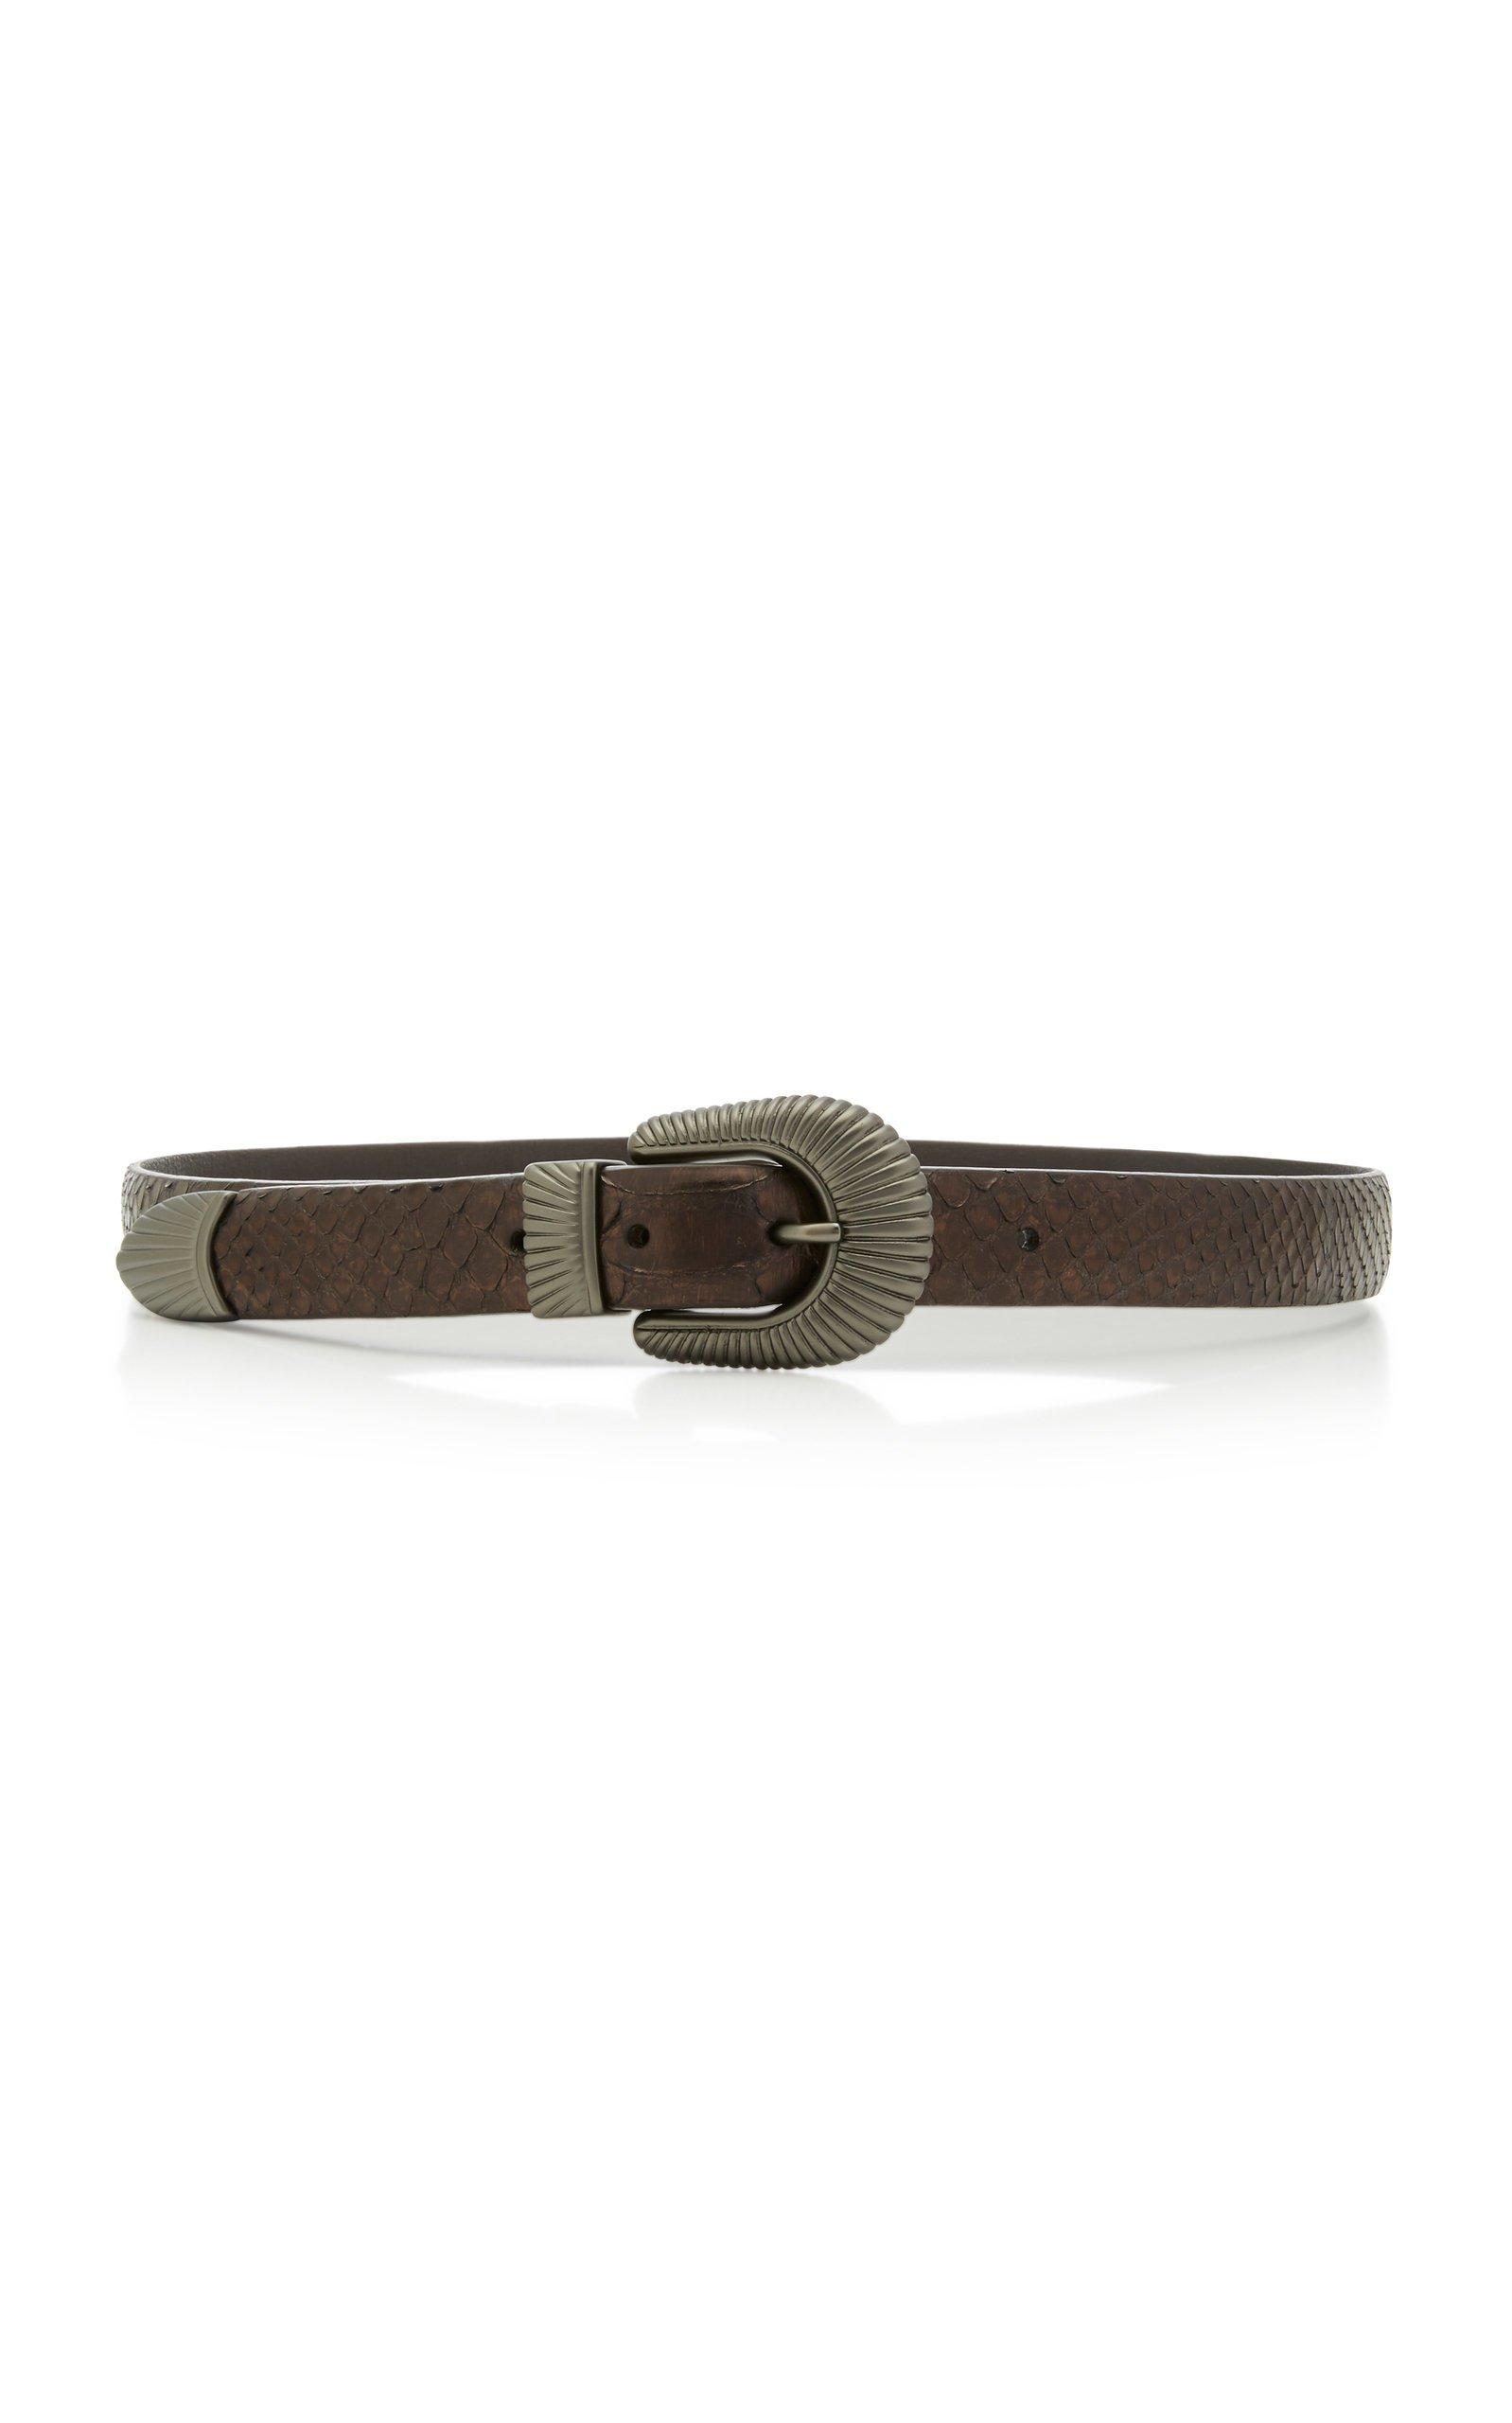 Anderson's Python Belt Size: 75 cm